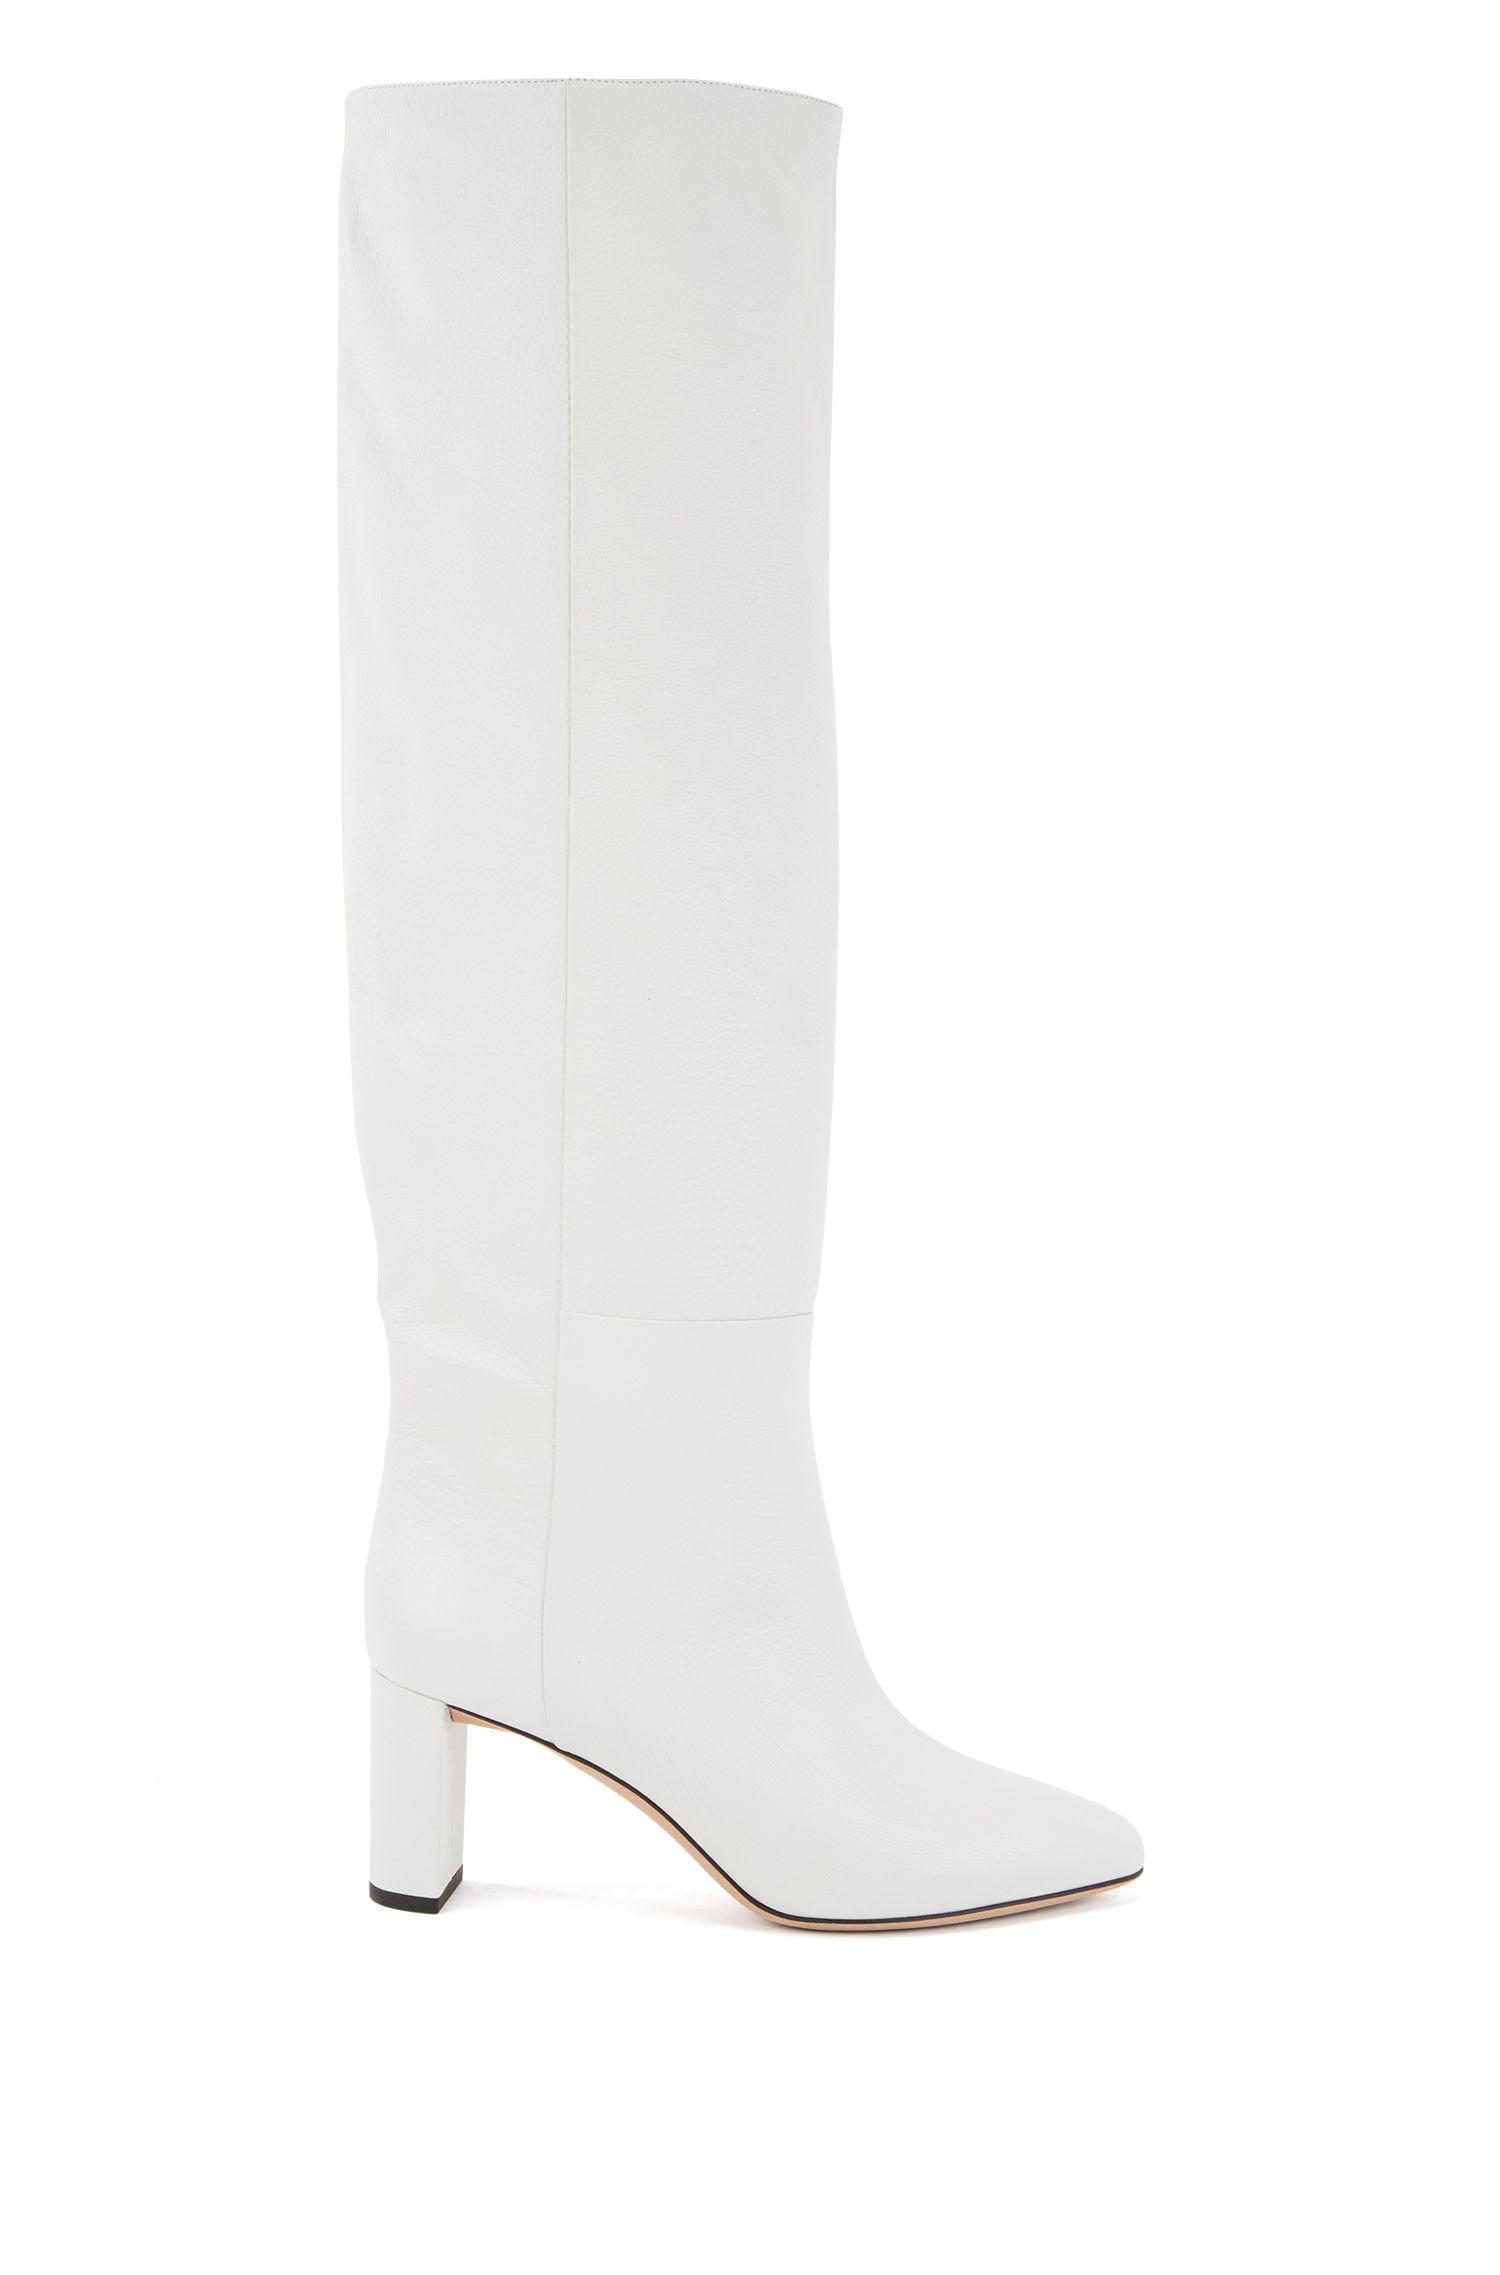 Knee-high boots in Italian calfskin, White